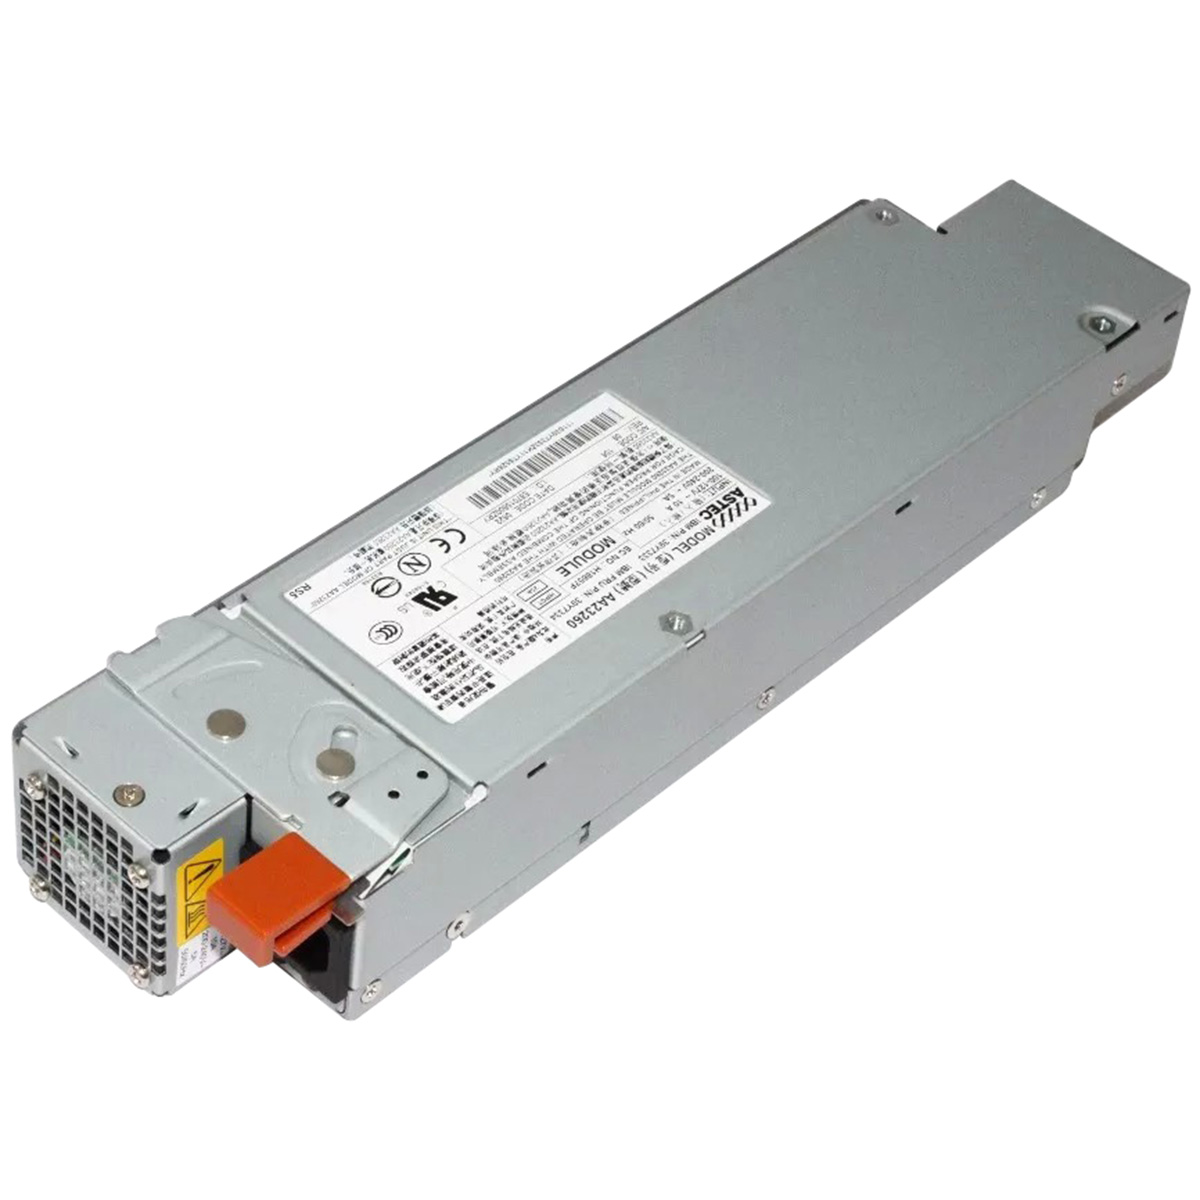 Fonte Servidor IBM X346 625w Astec AA23260 FRU 39Y7333 - Usada